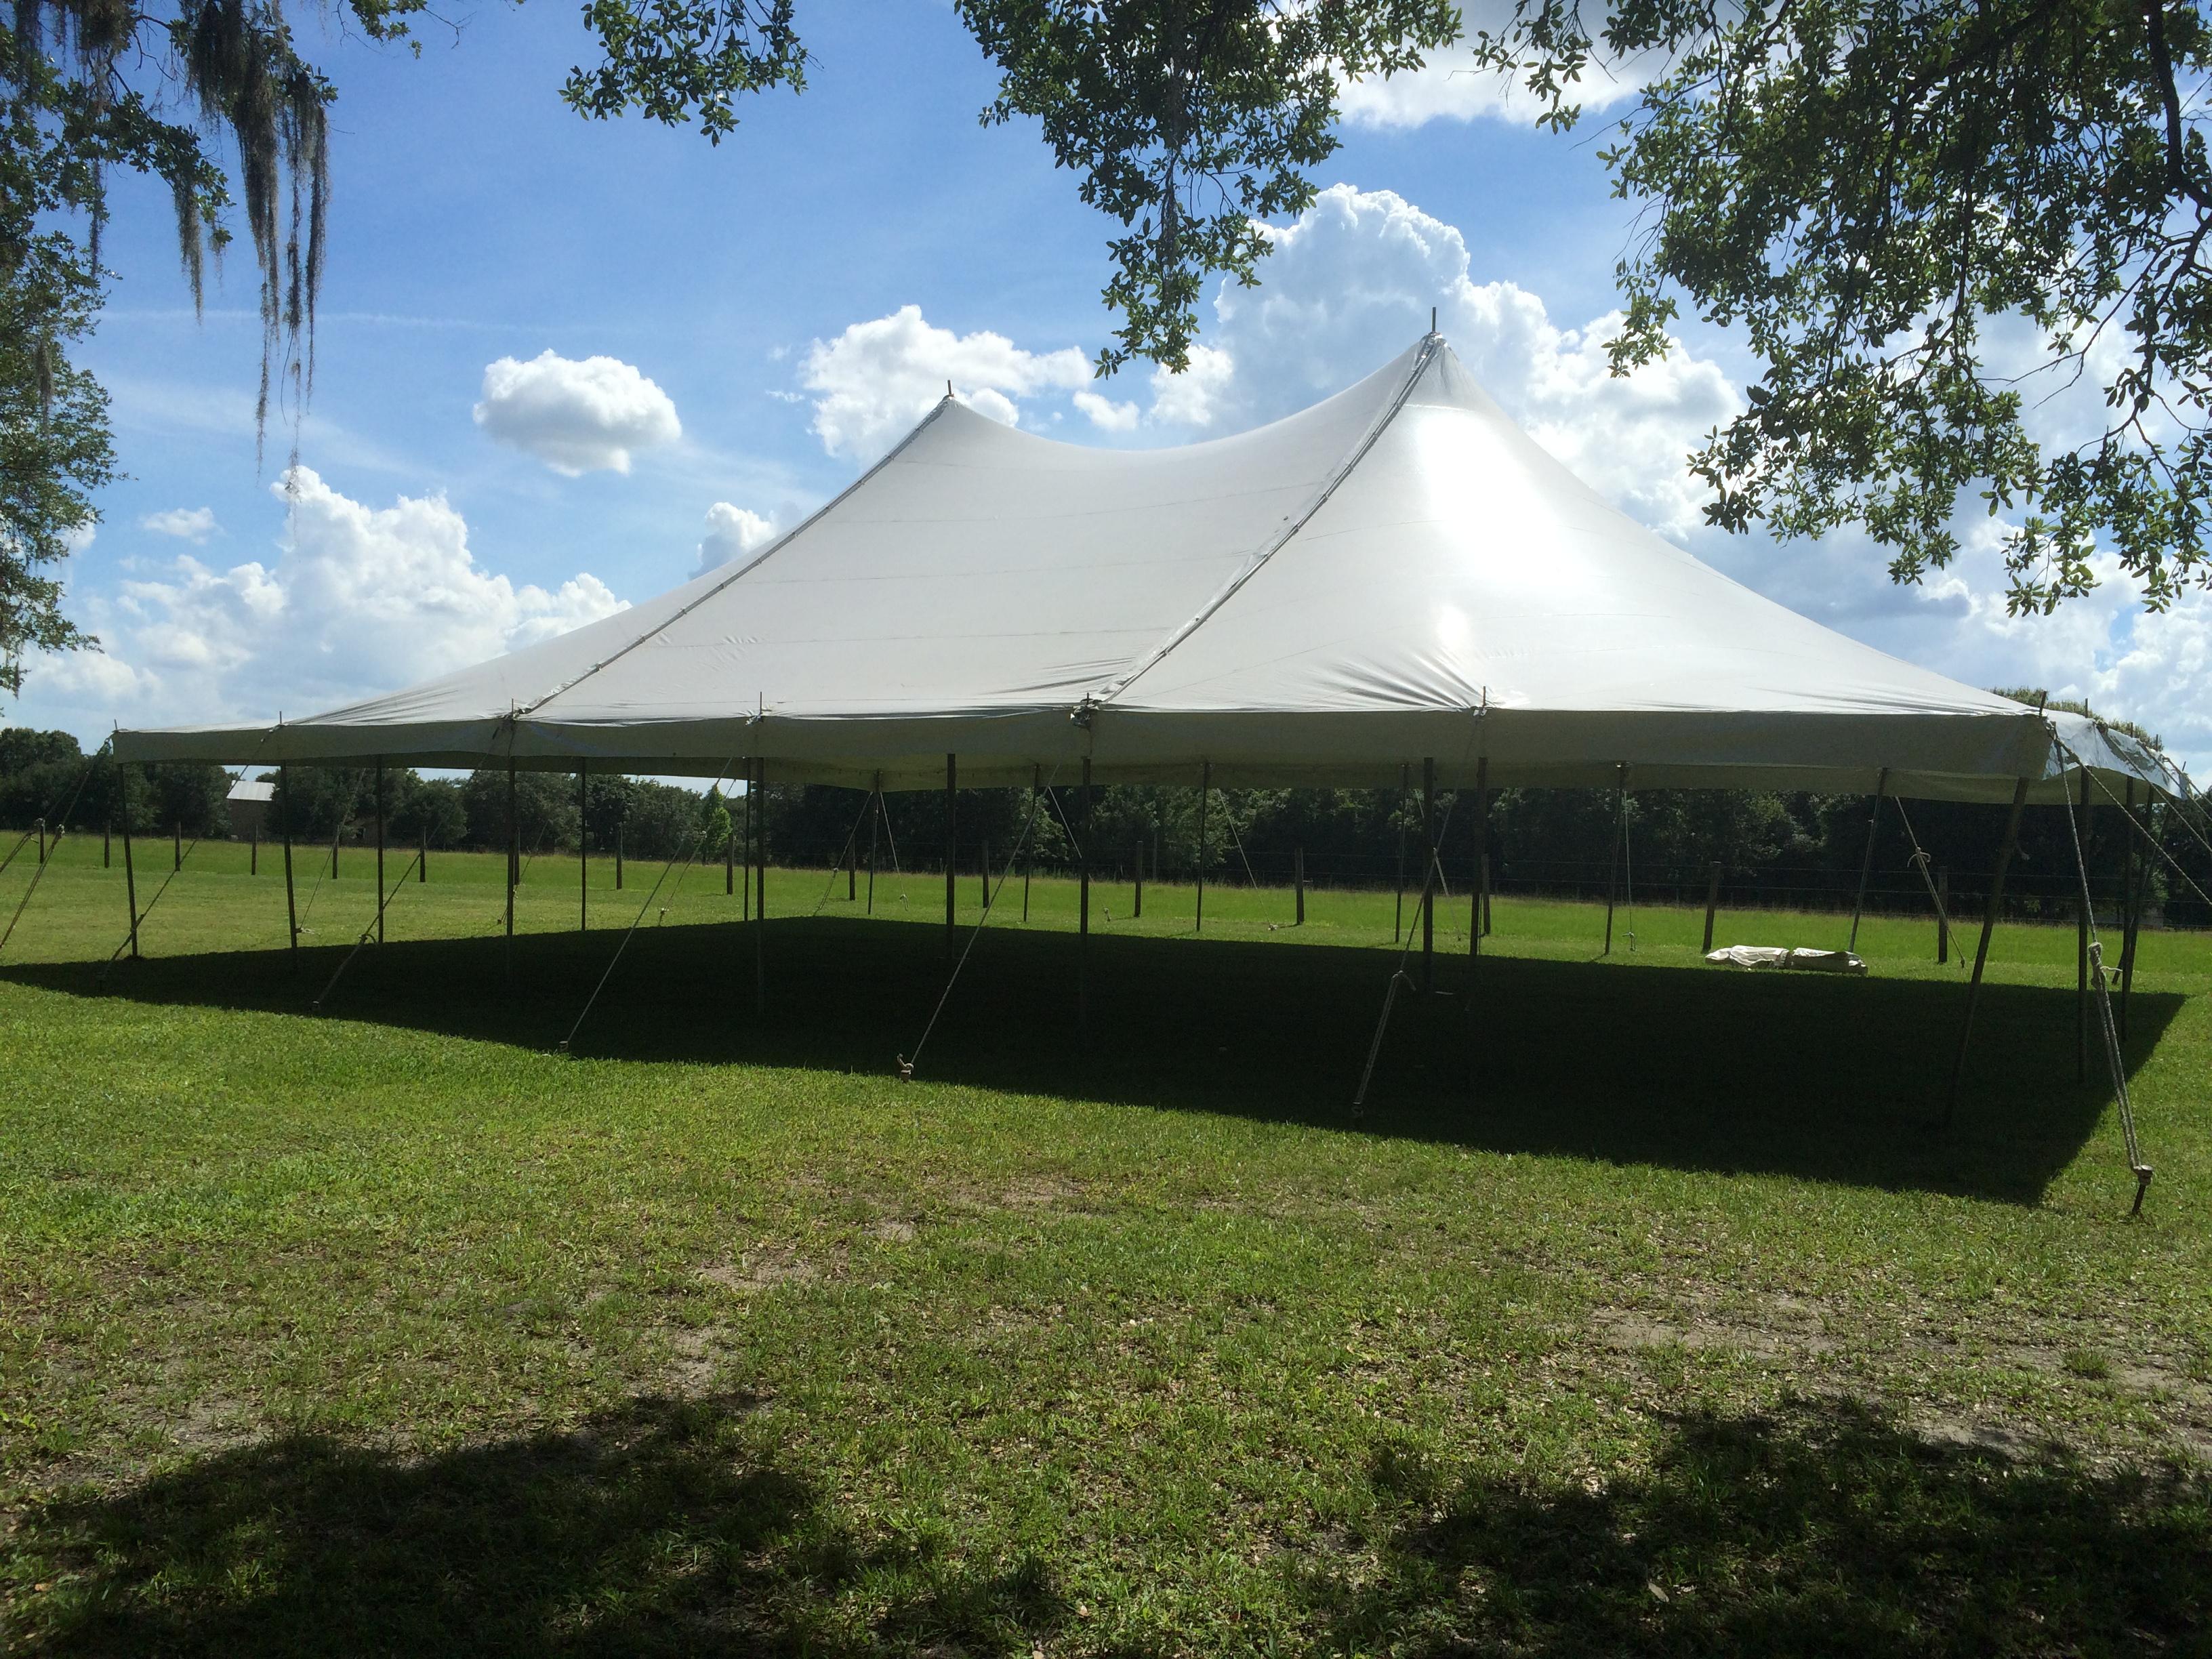 ... Tent 40 x 60 shade 1 ... & Big Tent Rental - Lakewood Tent Rental